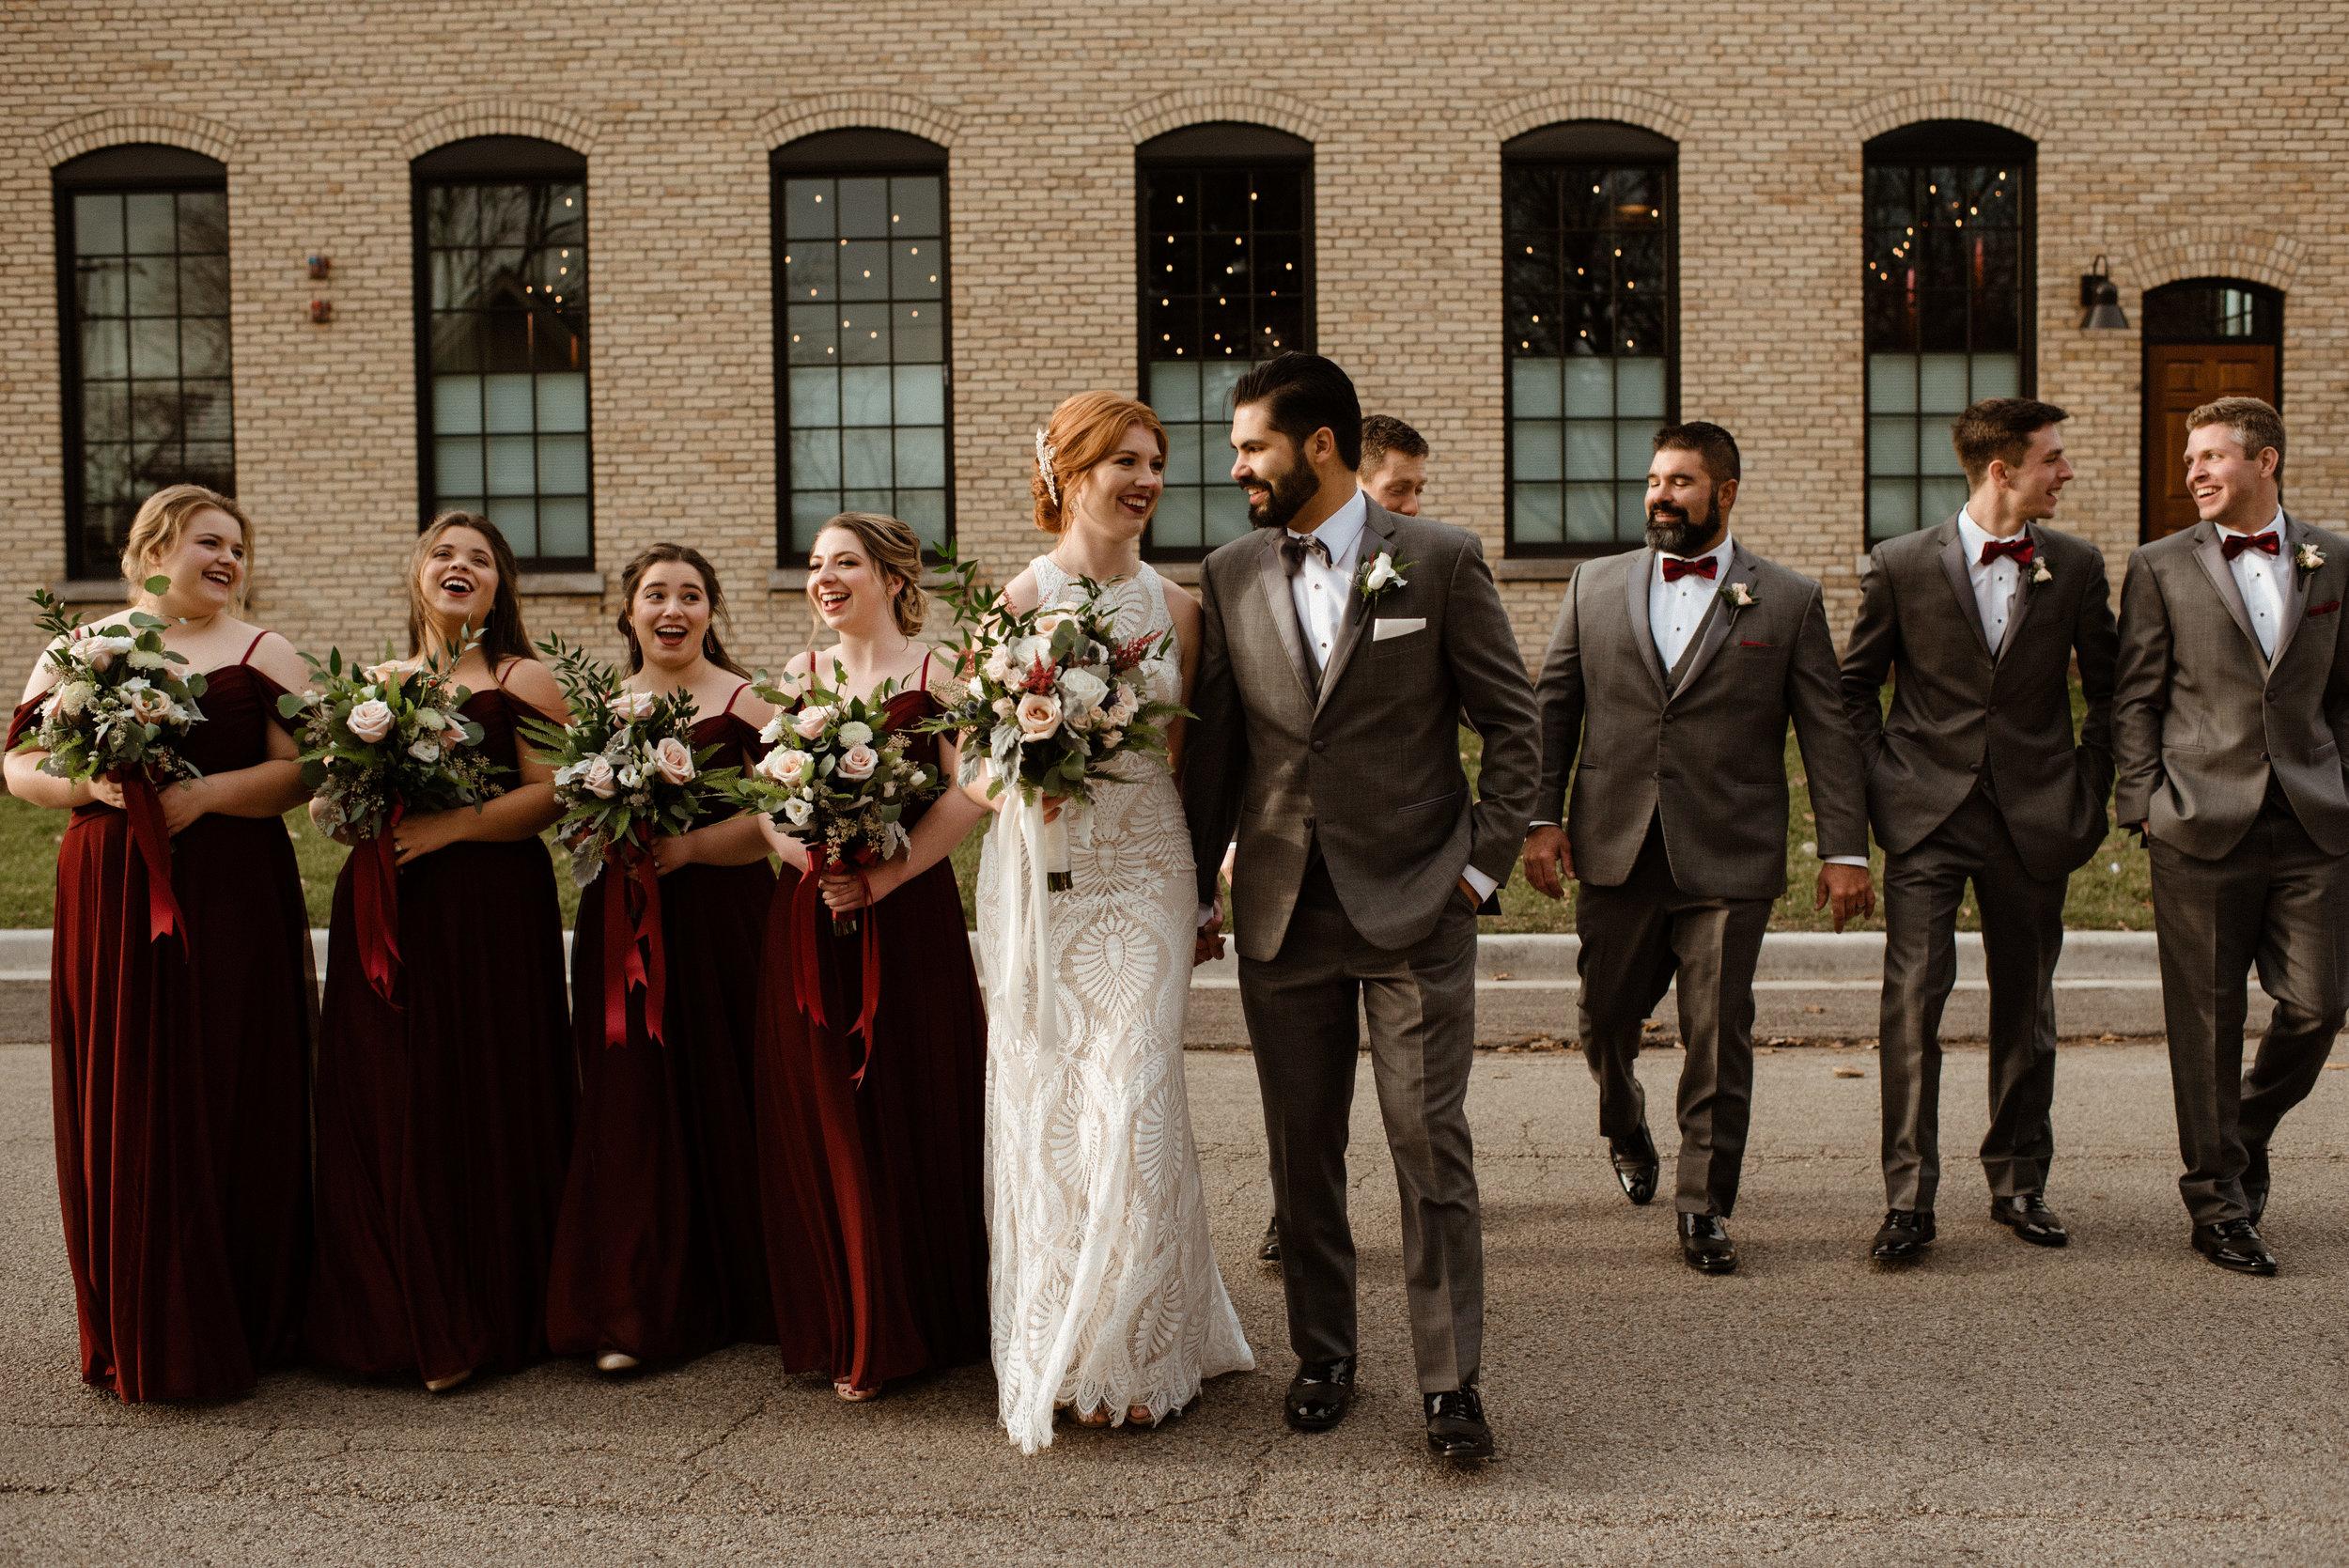 The Brix on Fox, Chicago Wedding Photographer, Zach and Rosalie00001.jpg